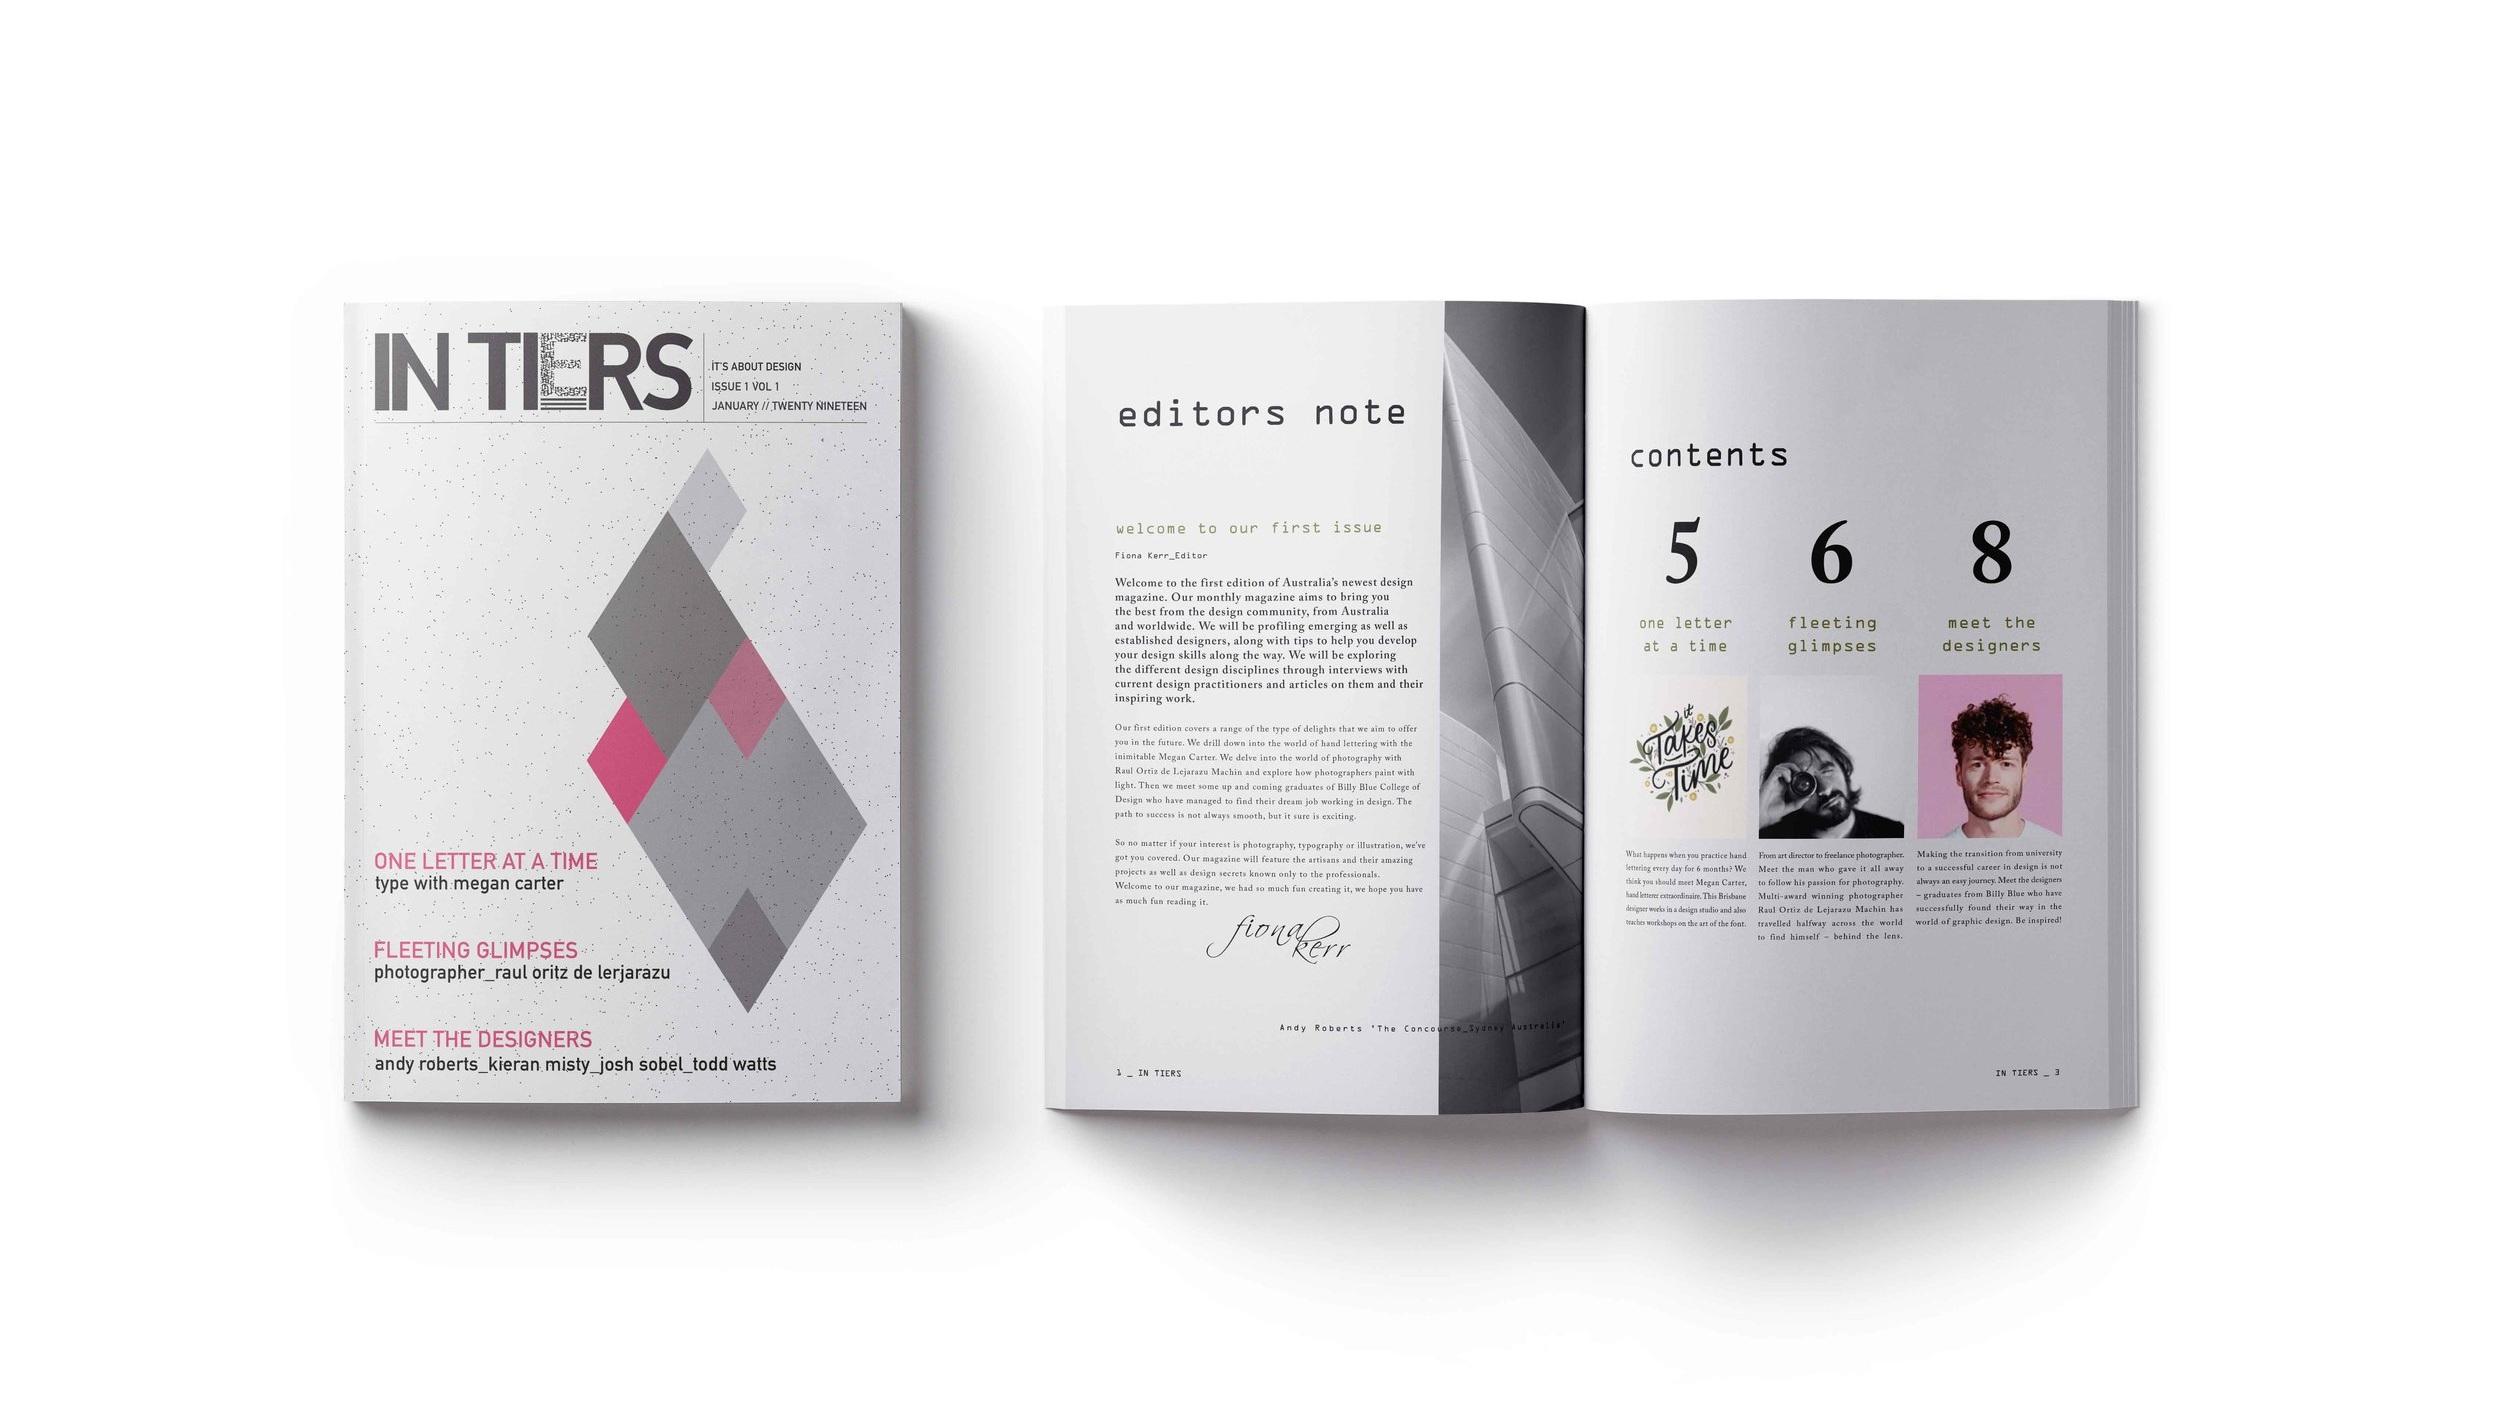 intiers-2.jpg